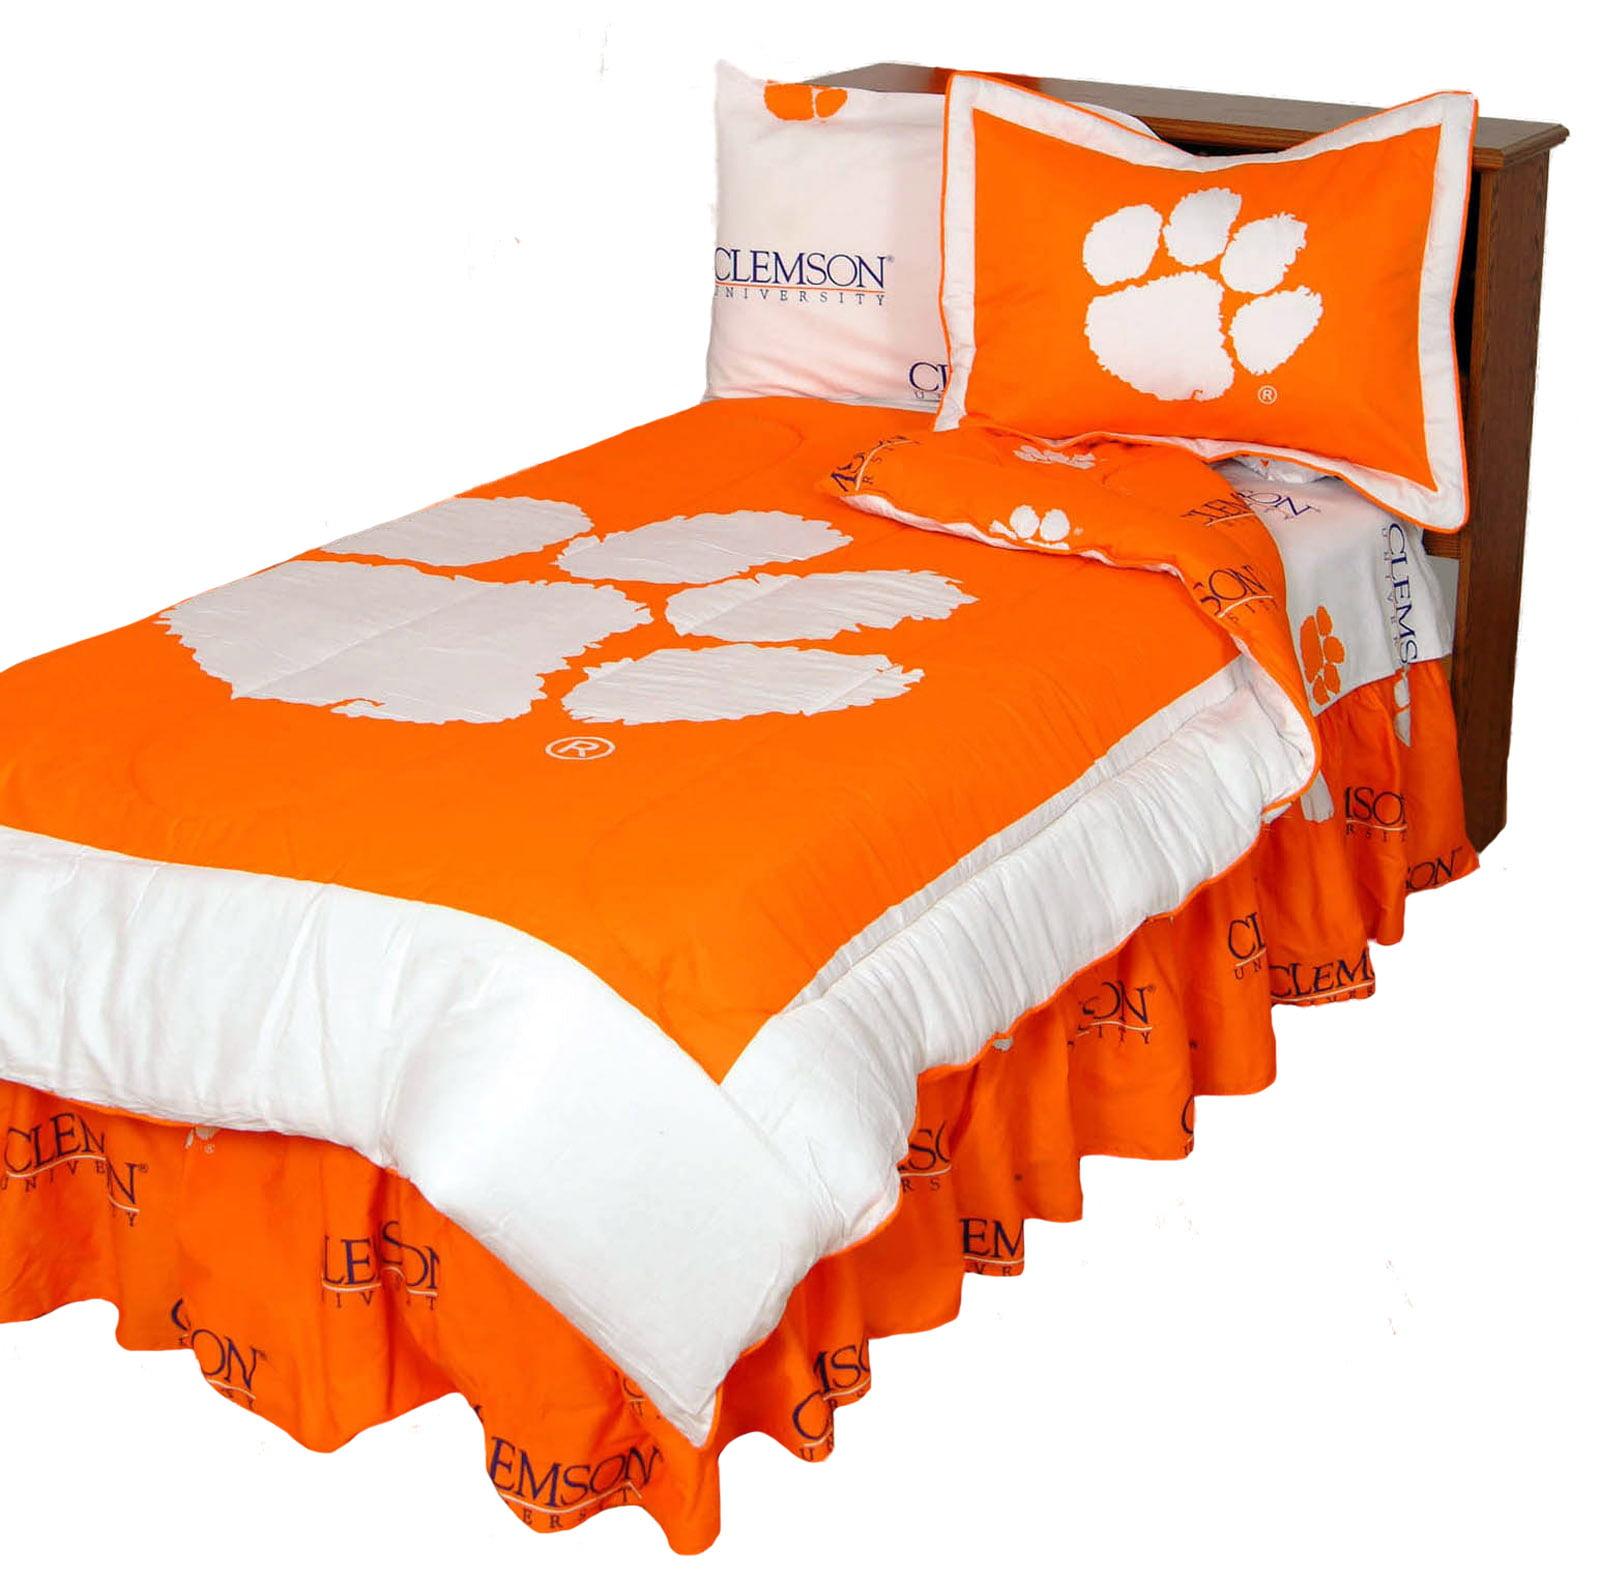 Clemson Tigers 3 Pc Comforter Set, 1 Comforter, 2 Shams, King